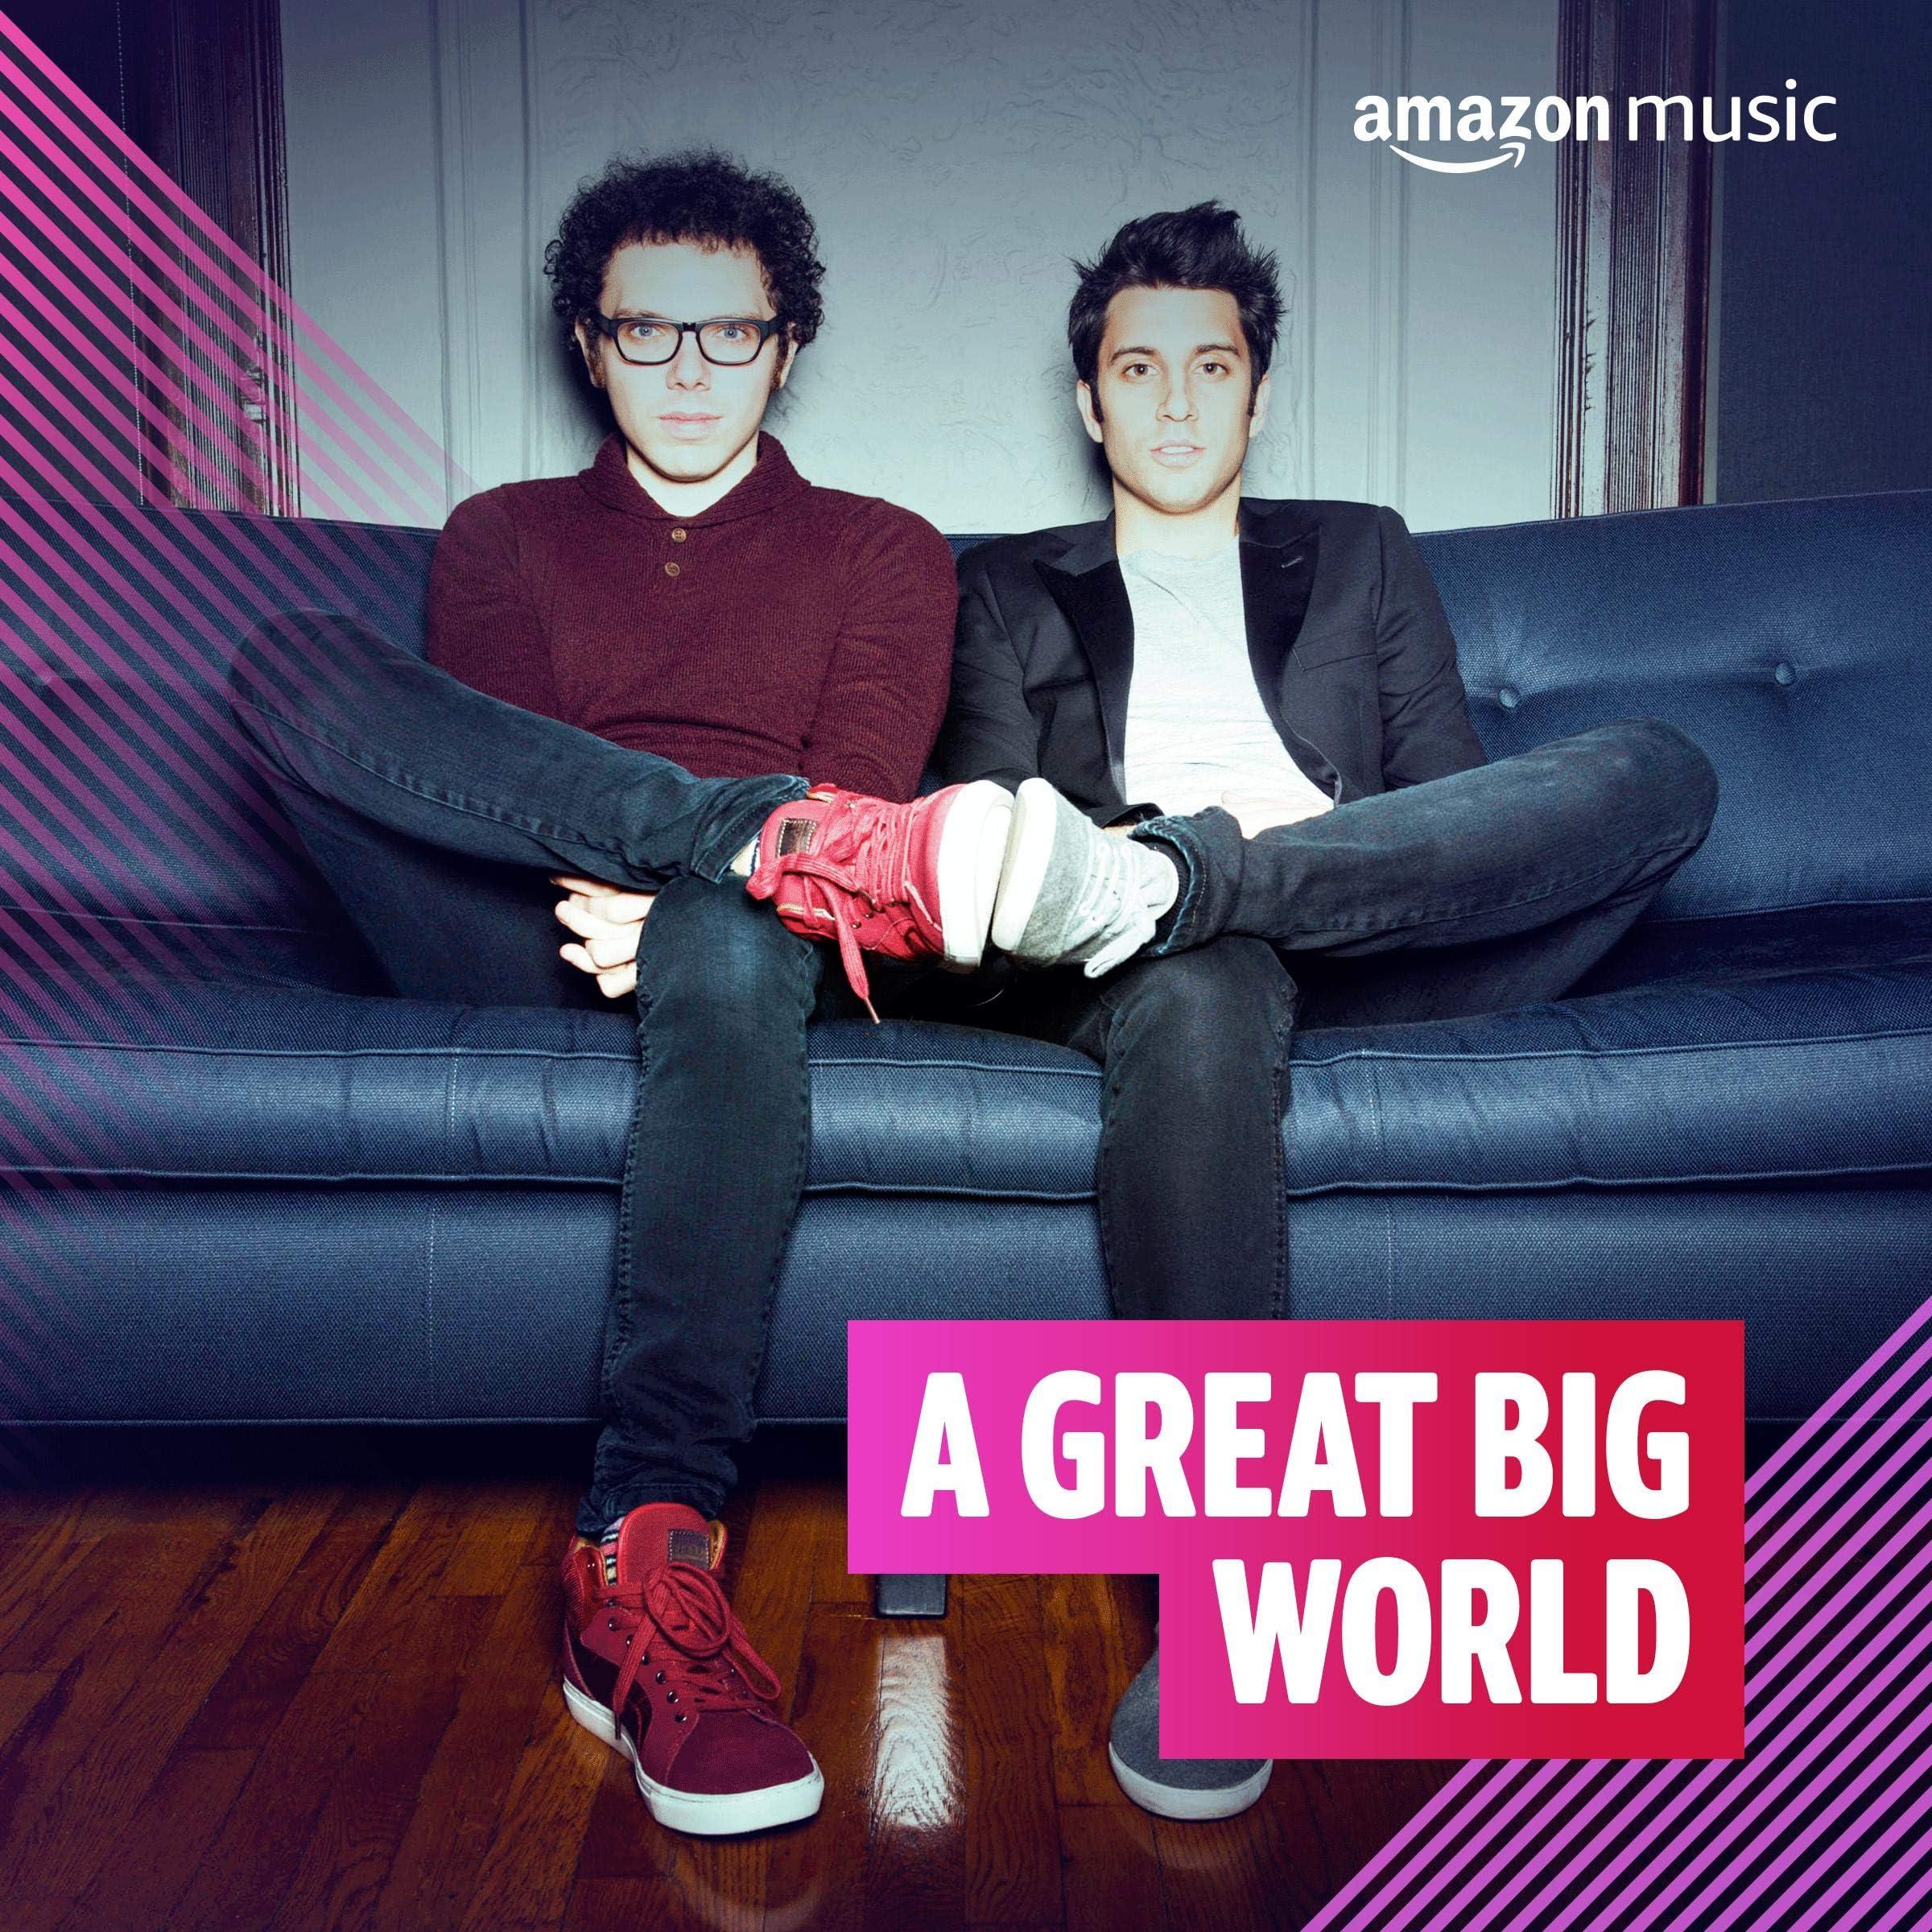 A Great Big World